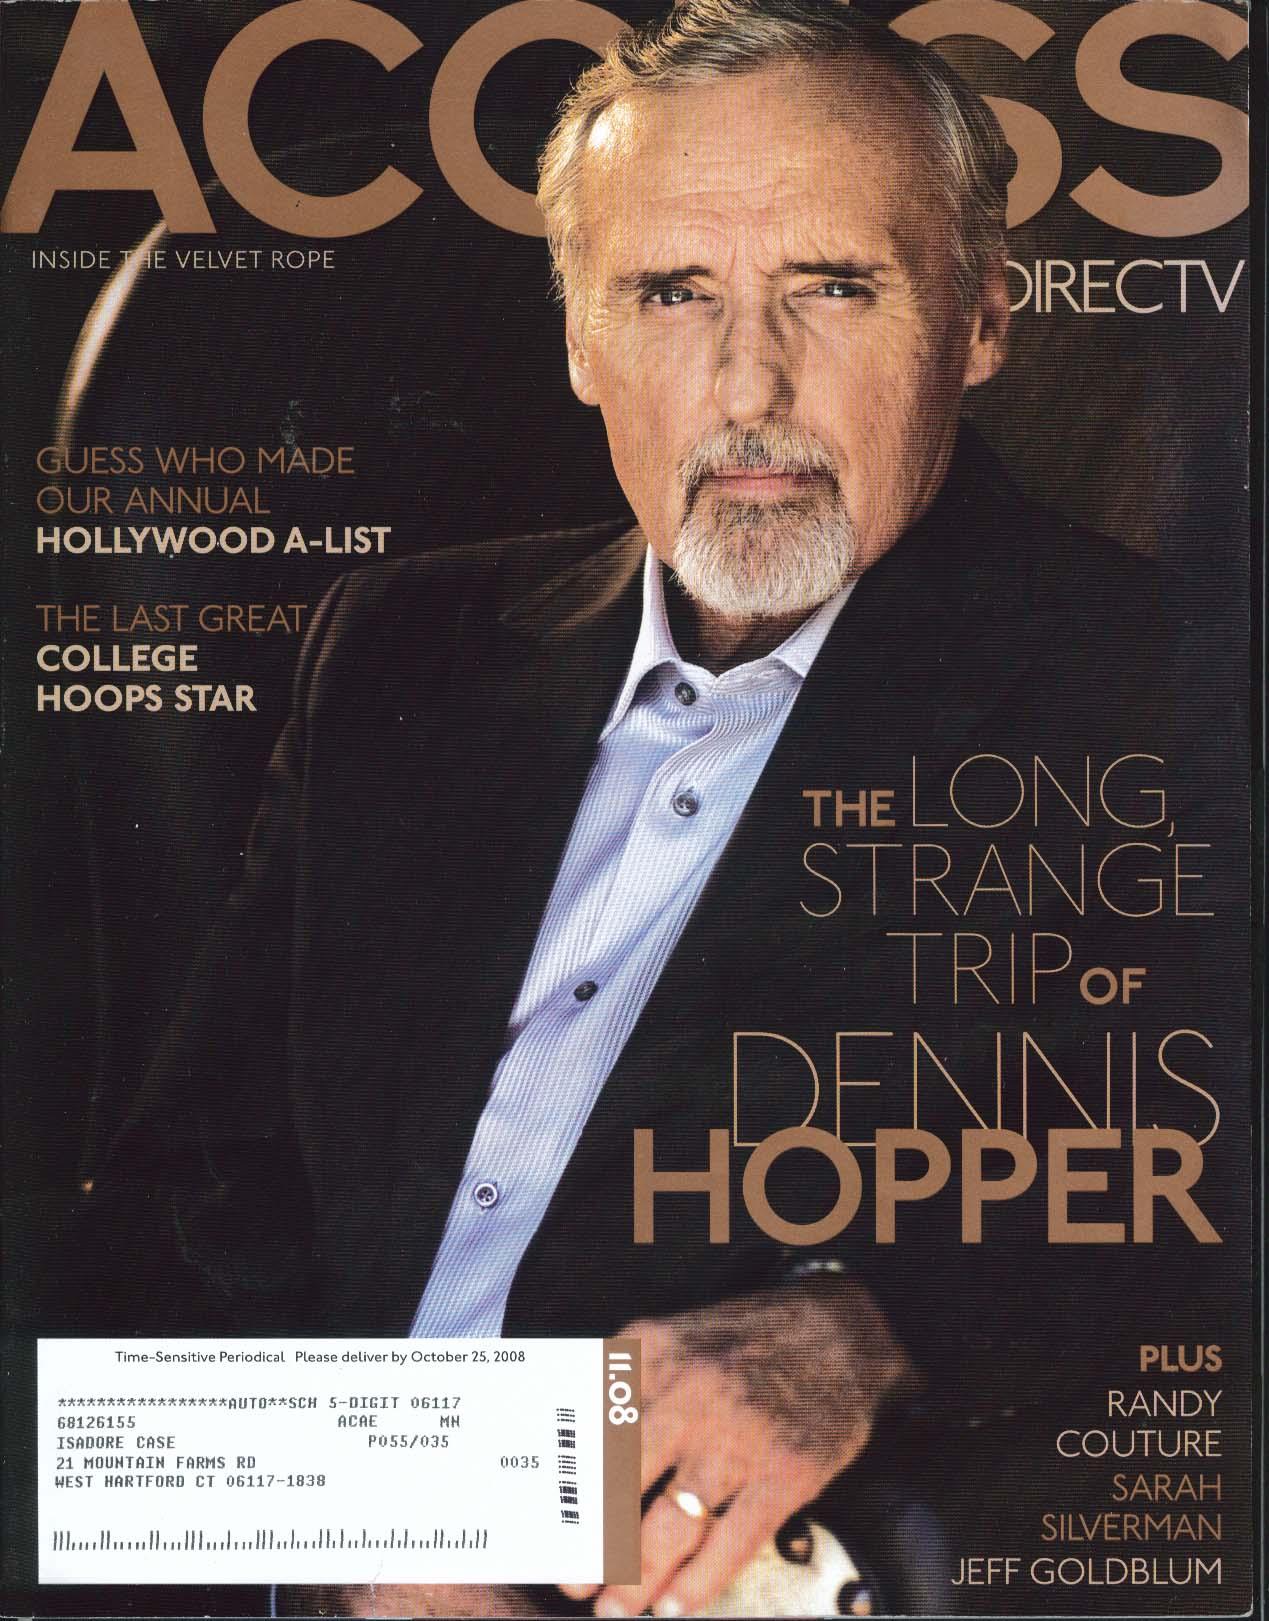 ACCESS DirecTV Dennis Hopper Randy Couture Sarah Silverman Jeff Goldblum 11 2008